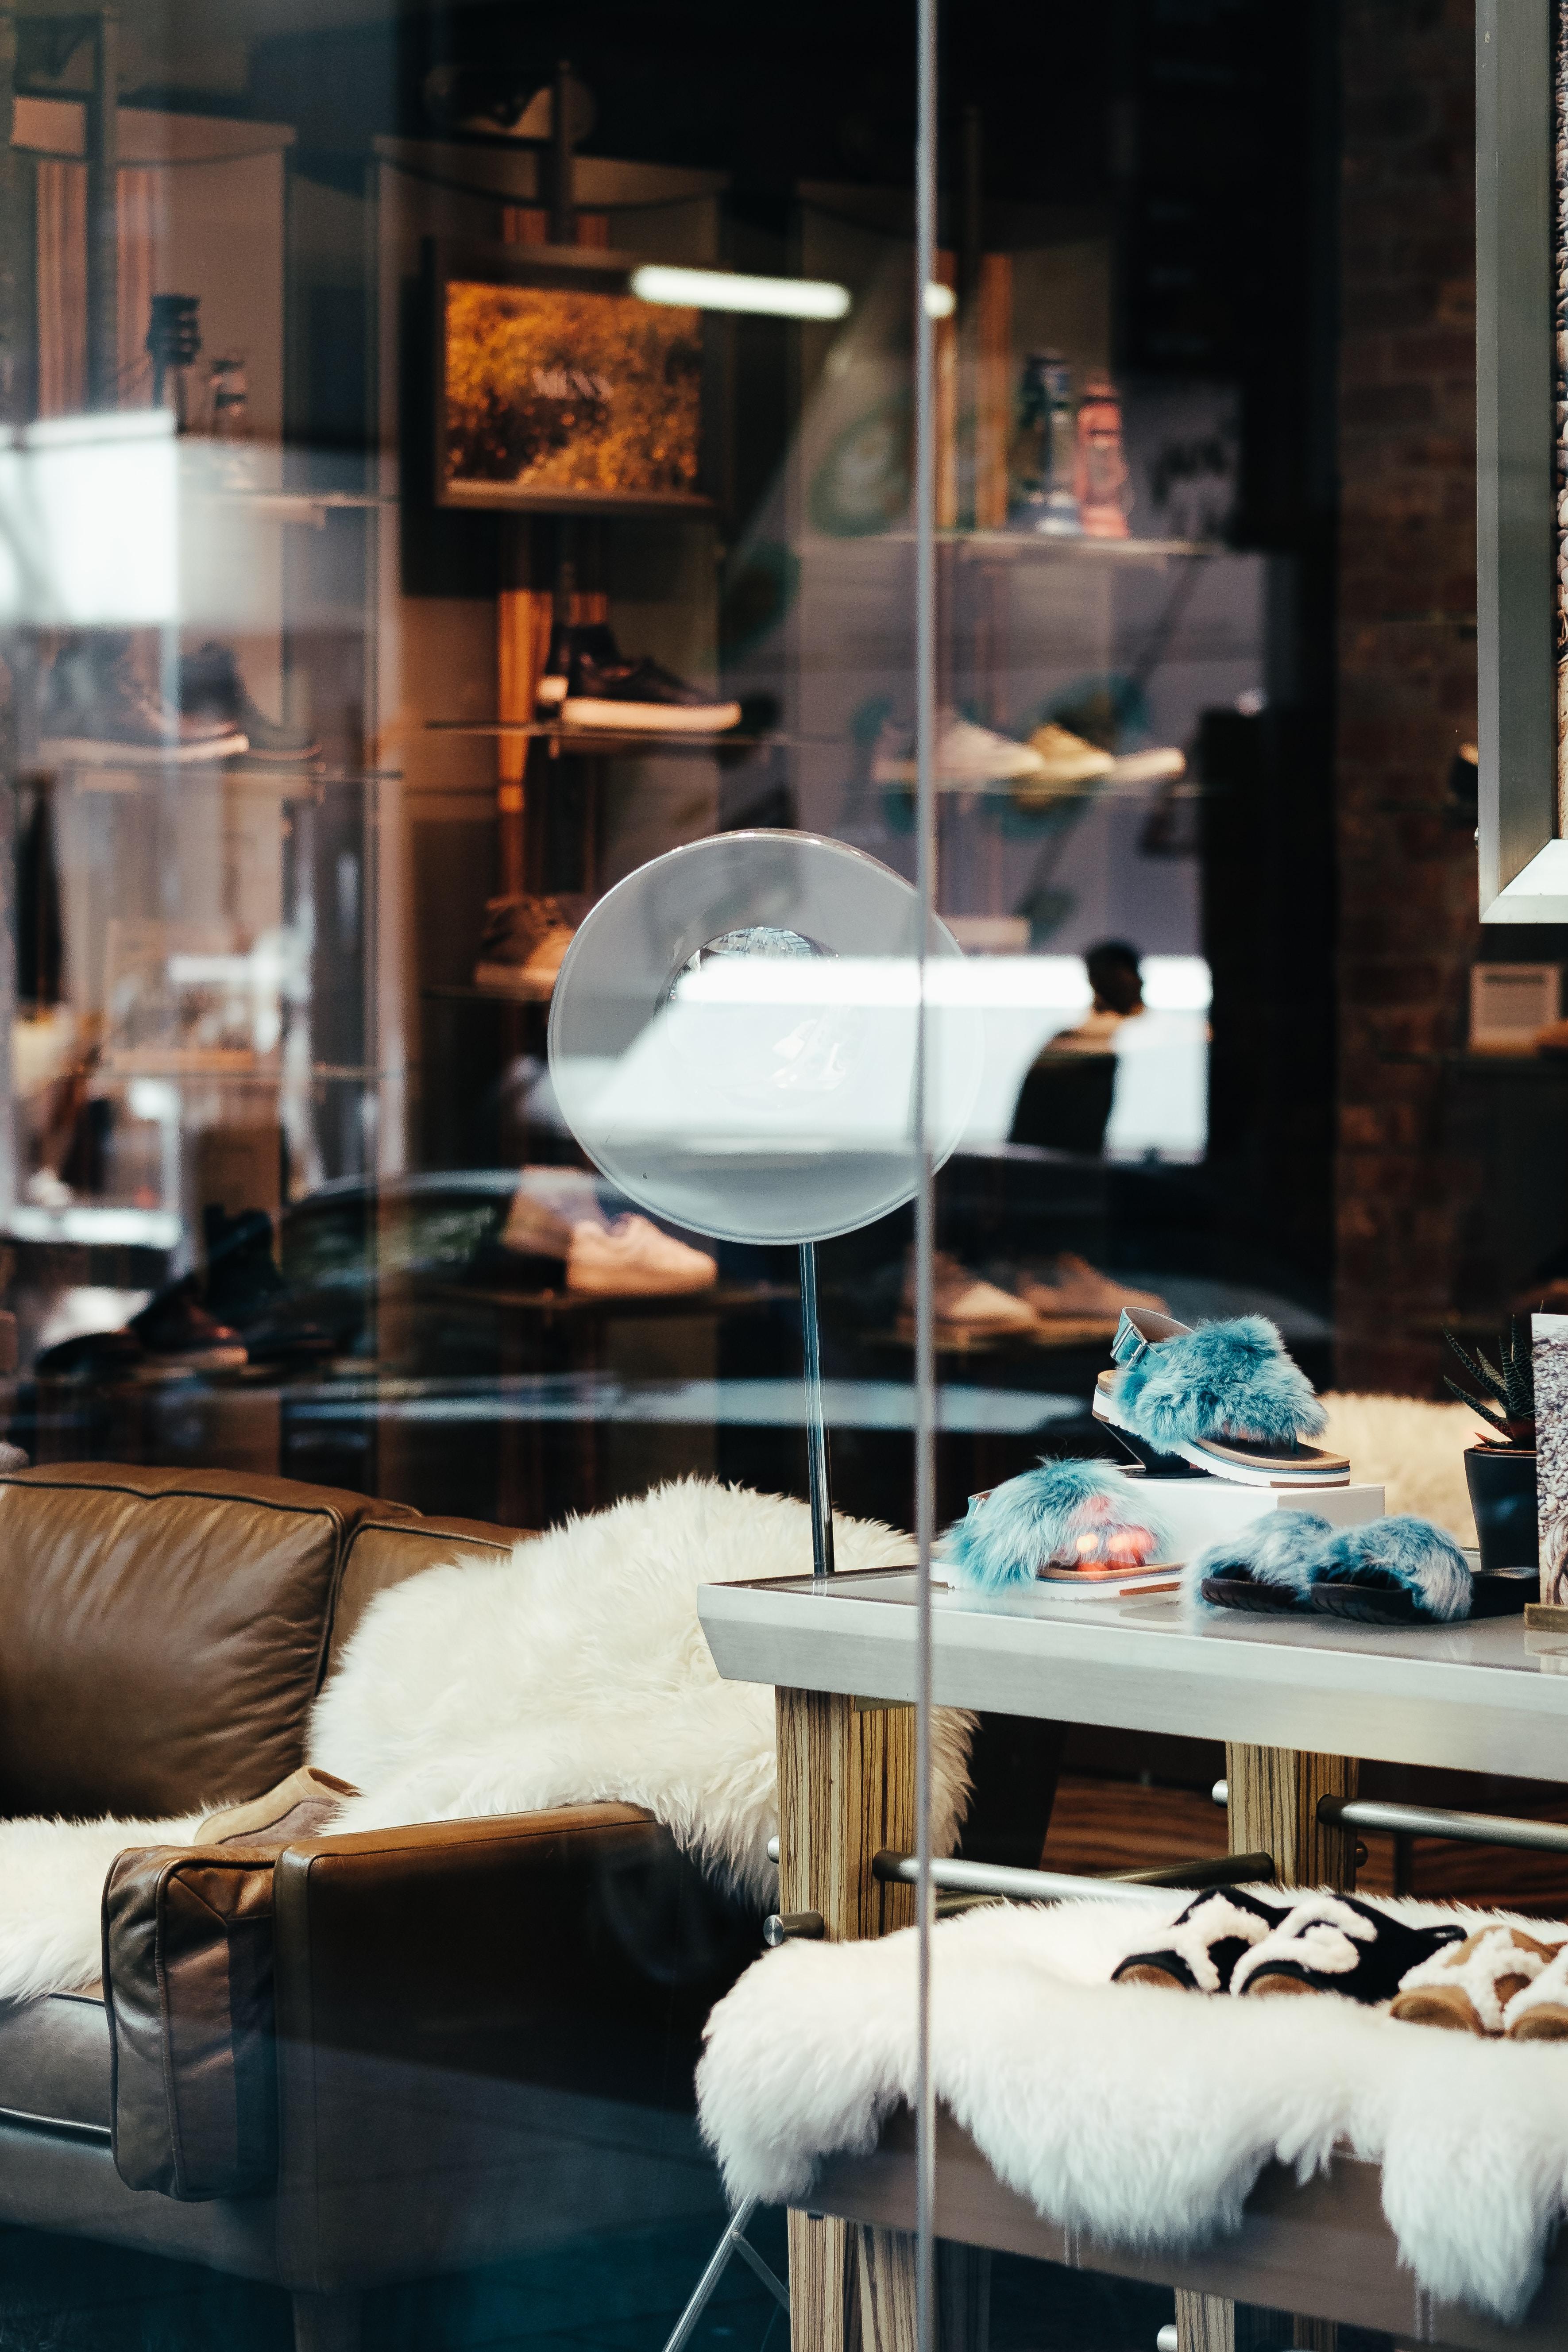 table lamp beside sofa